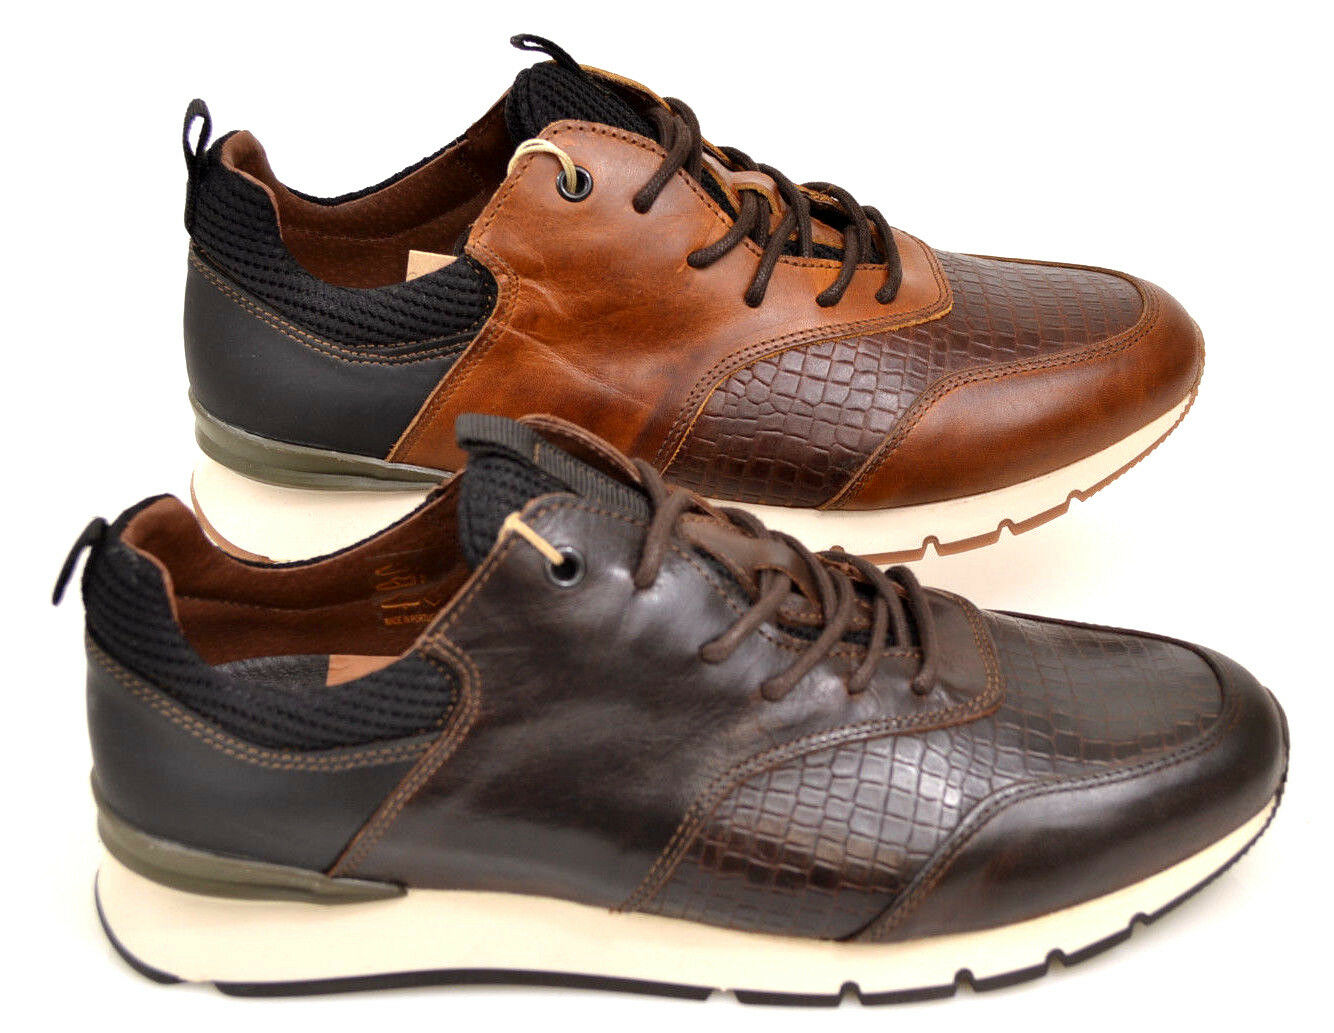 Designer Herren Schuhe edel Sneaker camel braun Neu Coxx Gr.41-46 NEU SALE